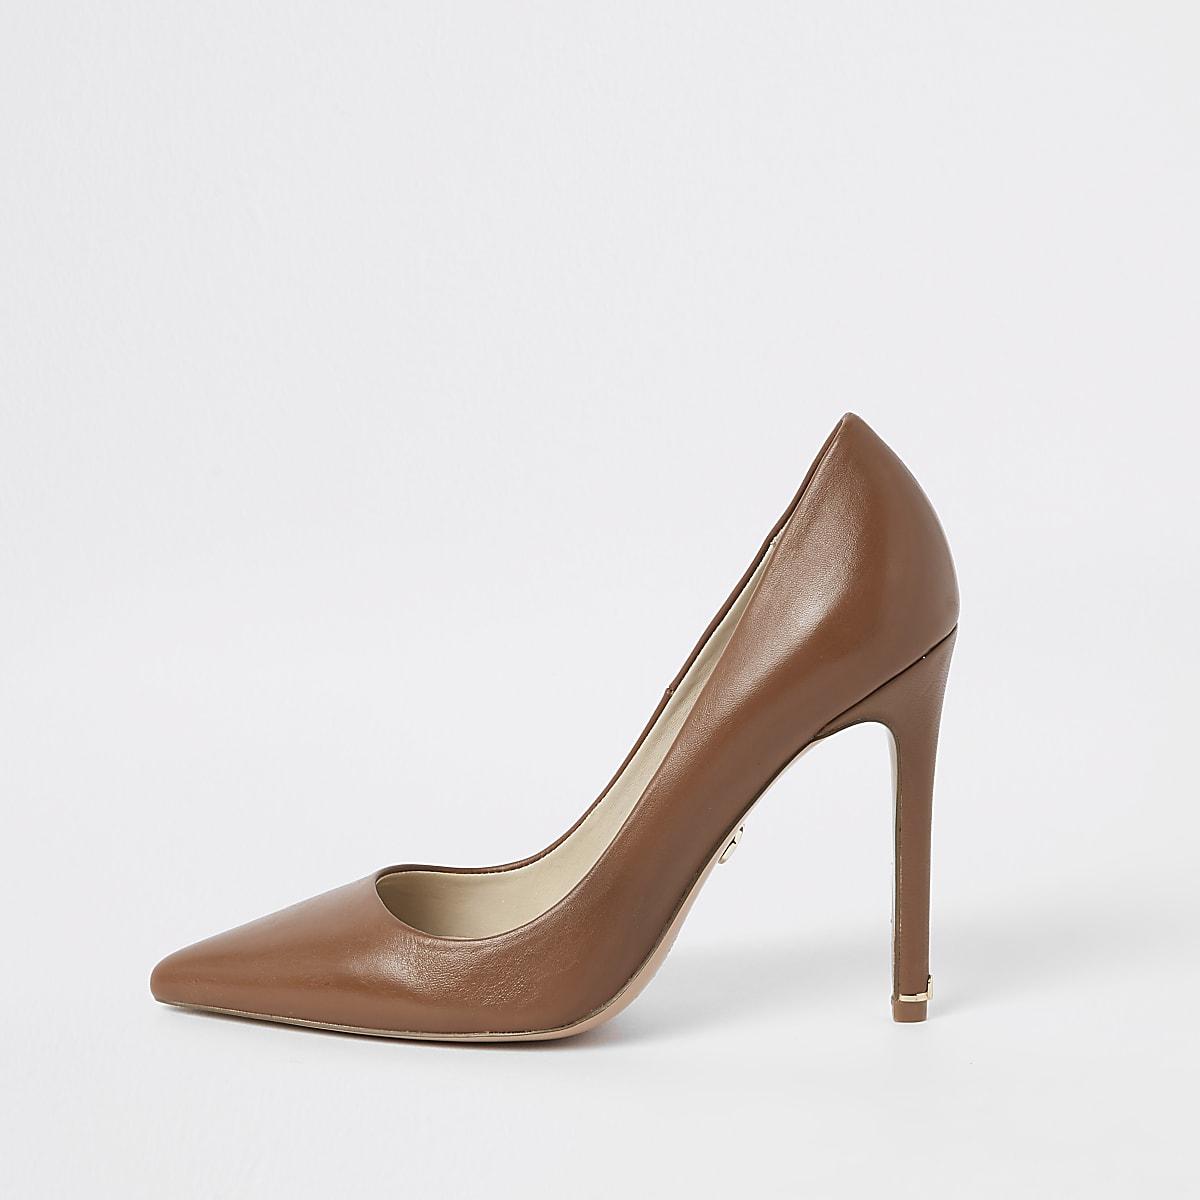 e7558039503 Brown plush leather court shoes - Shoes - Shoes   Boots - women